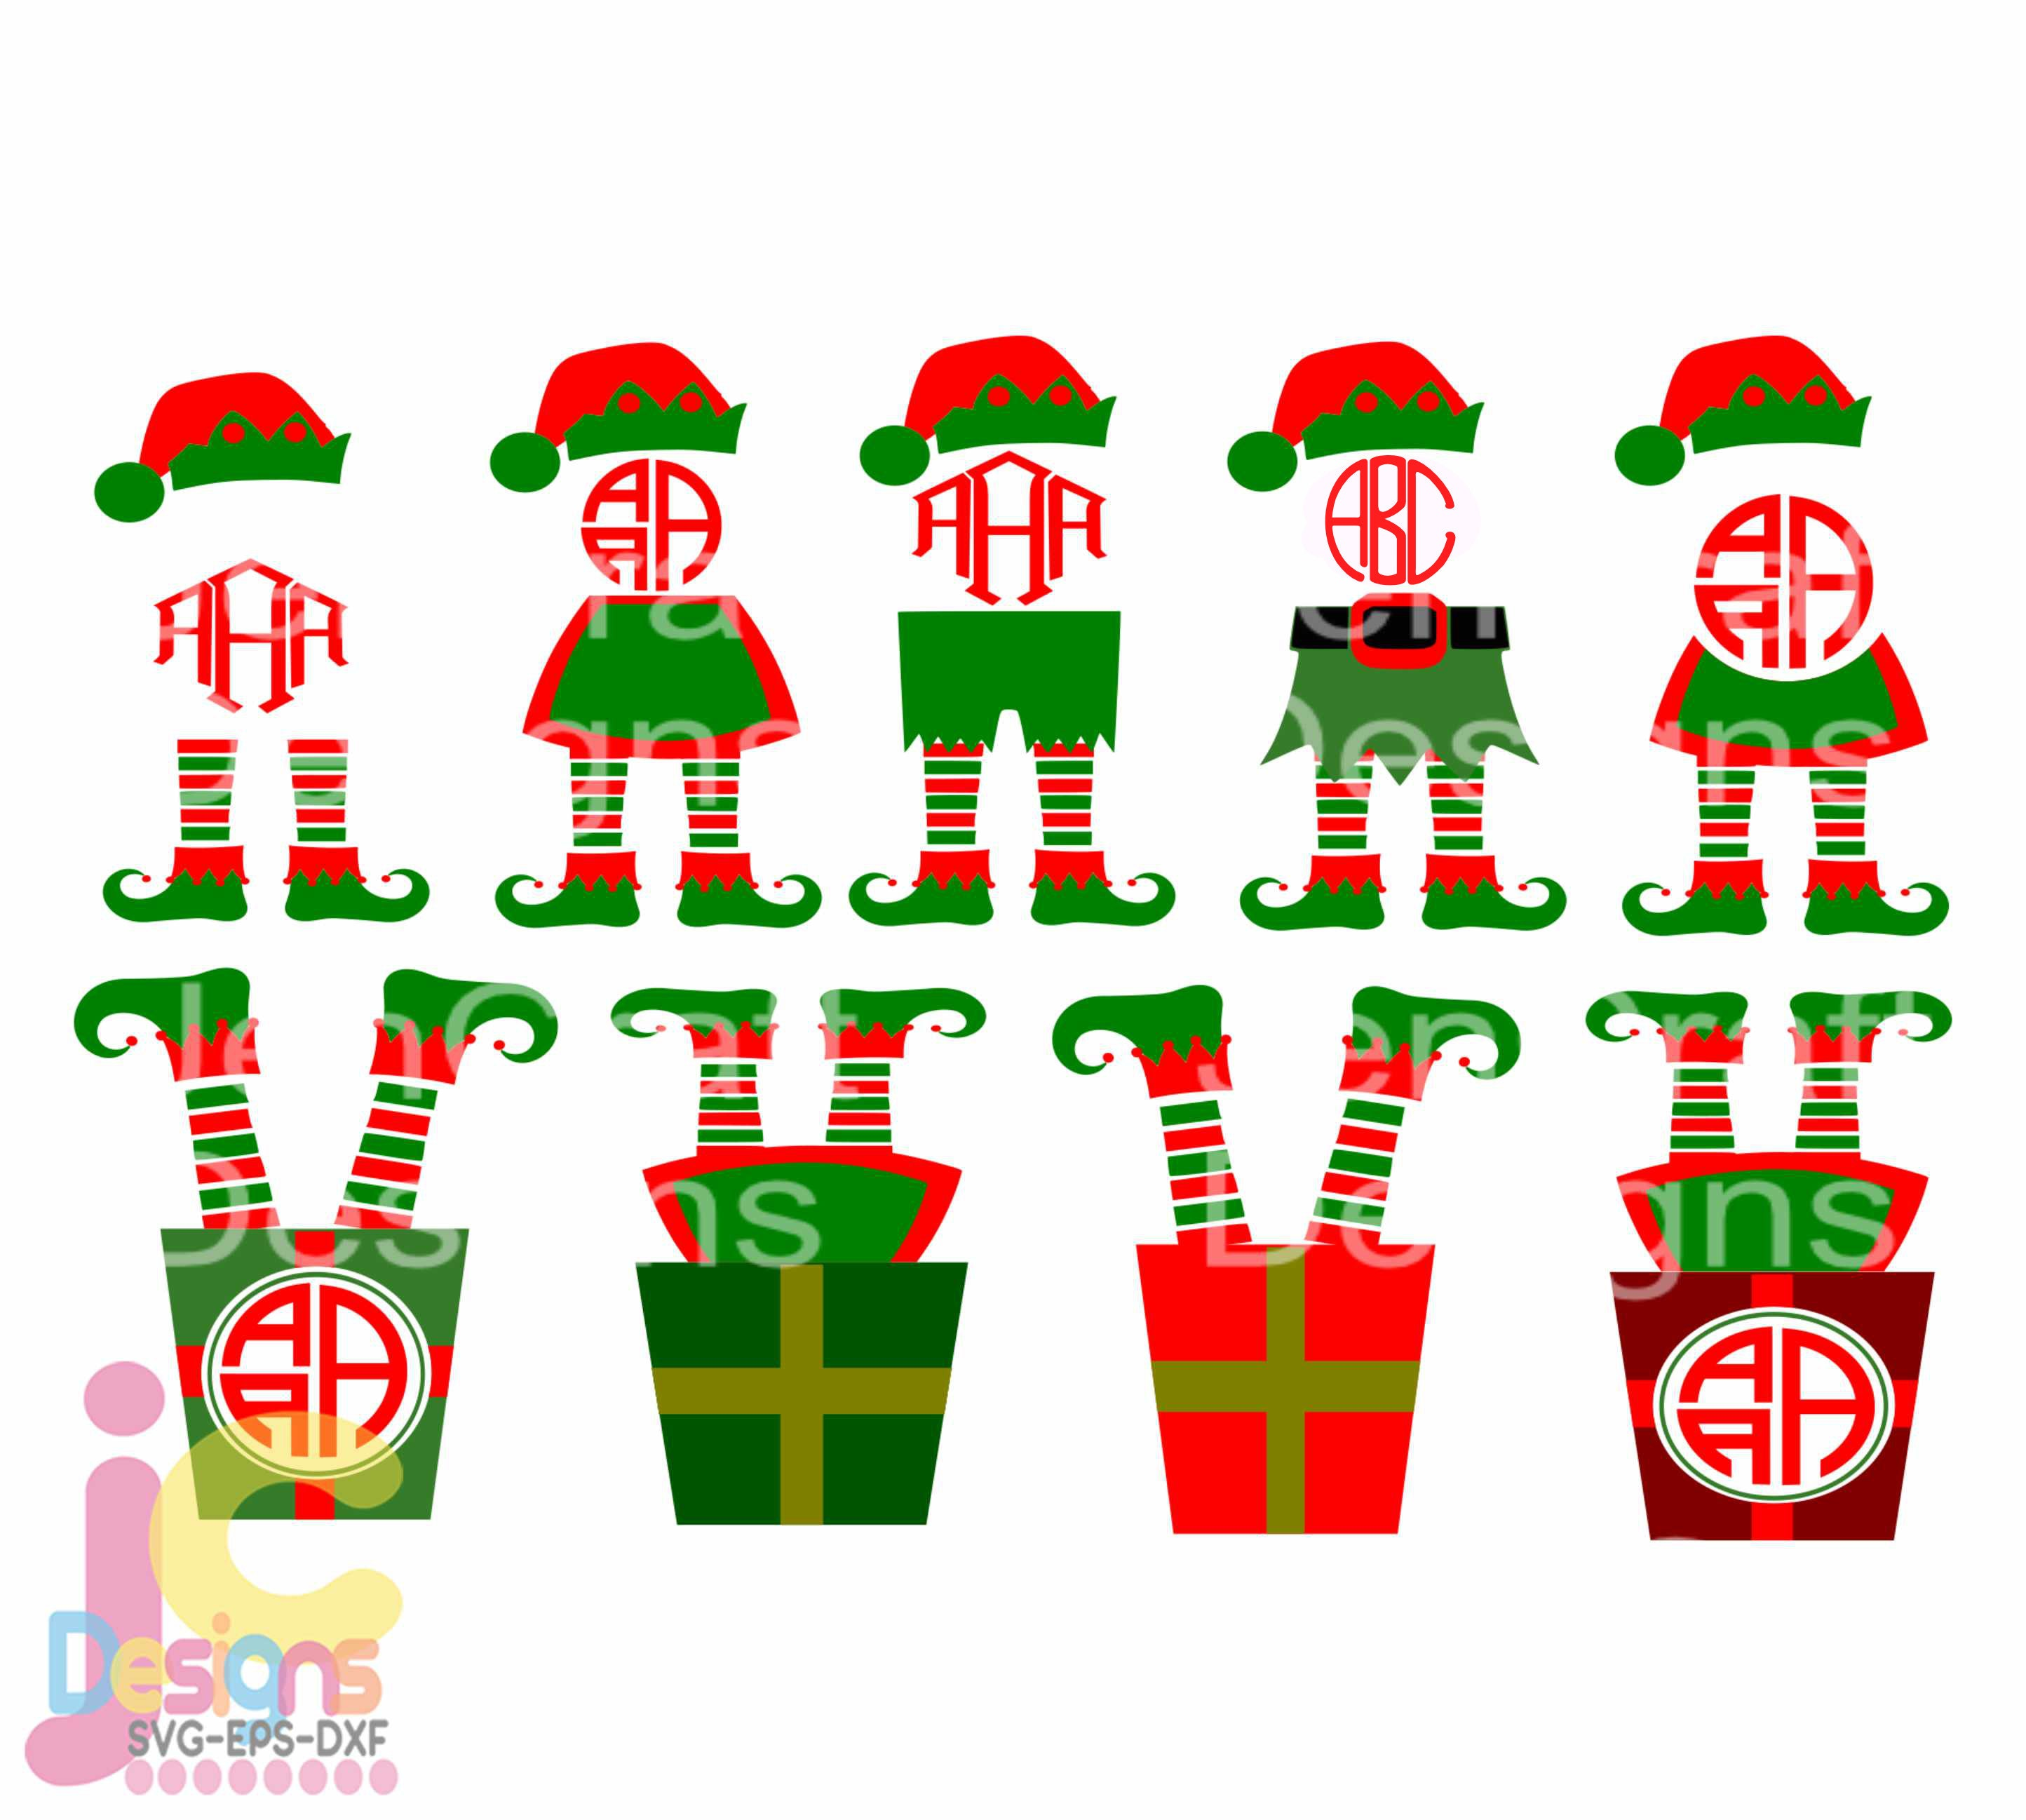 Christmas Svg Elf Legs Svg Monogram Frame Design Digital Clipart Cut File Png Svg Eps Dxf Instant Download Silhouette Cameo Cricut